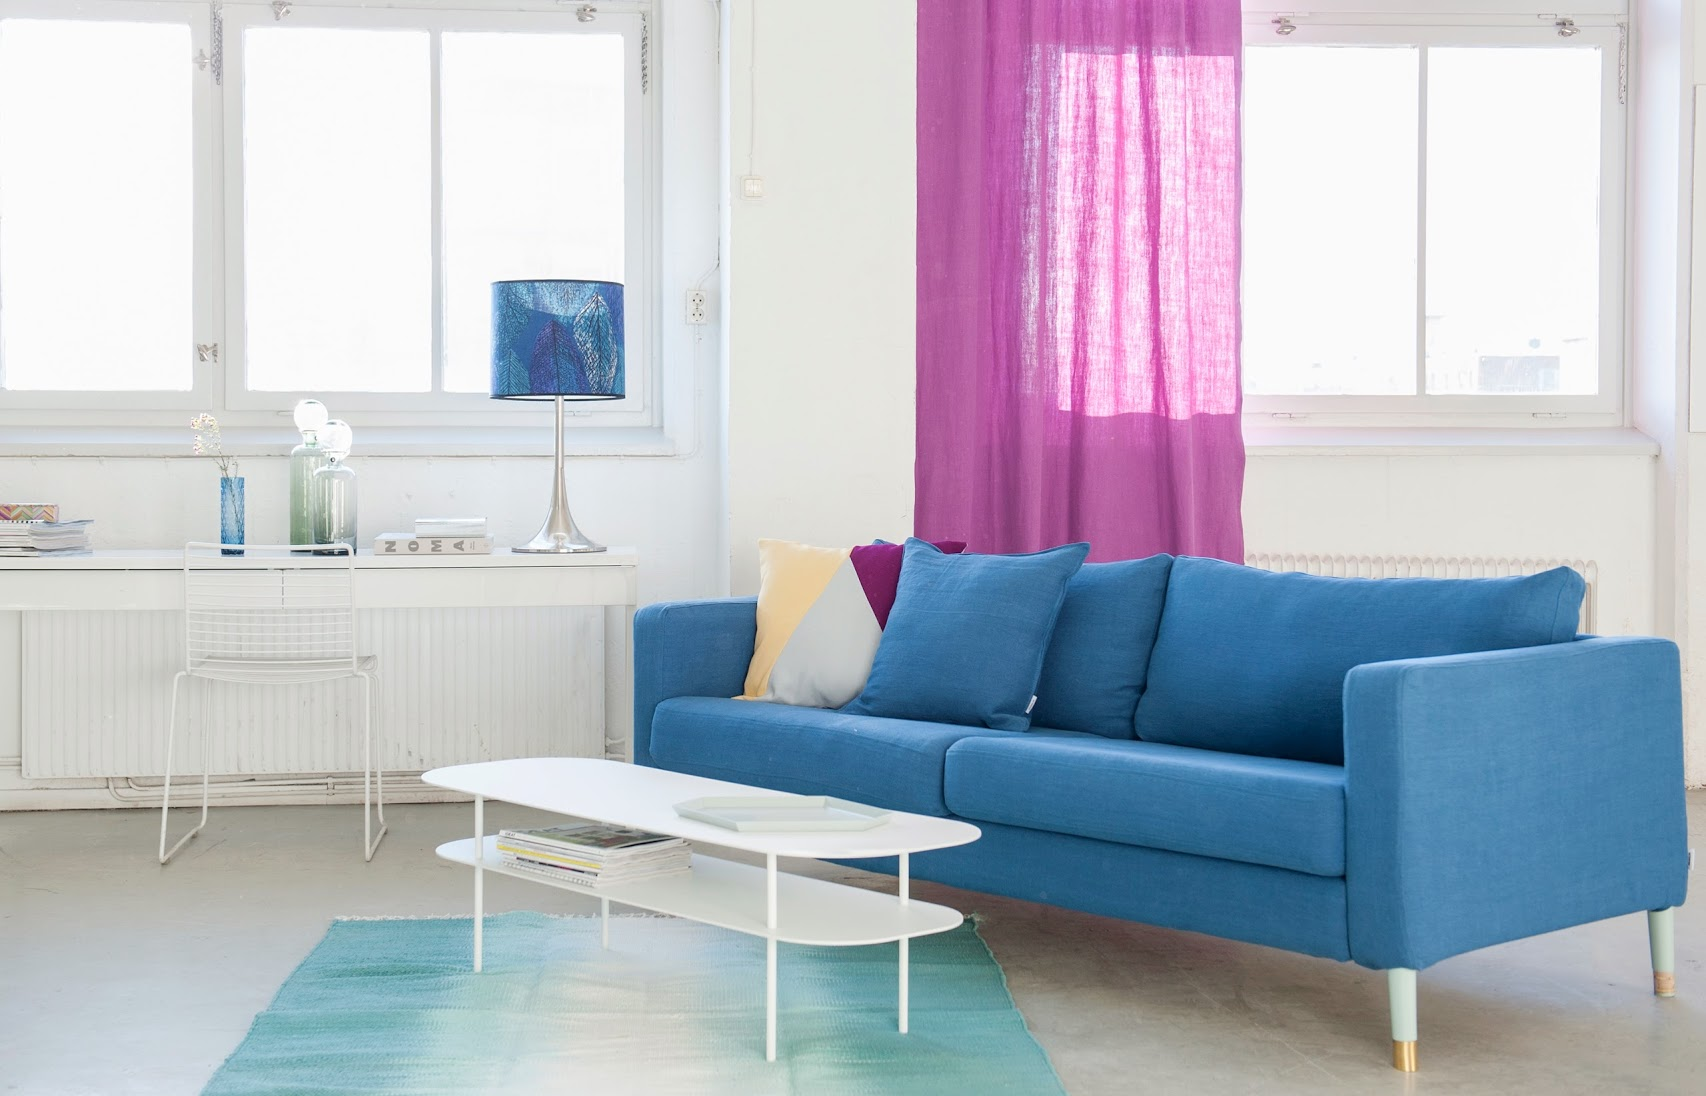 Personnaliser ses meubles ikea